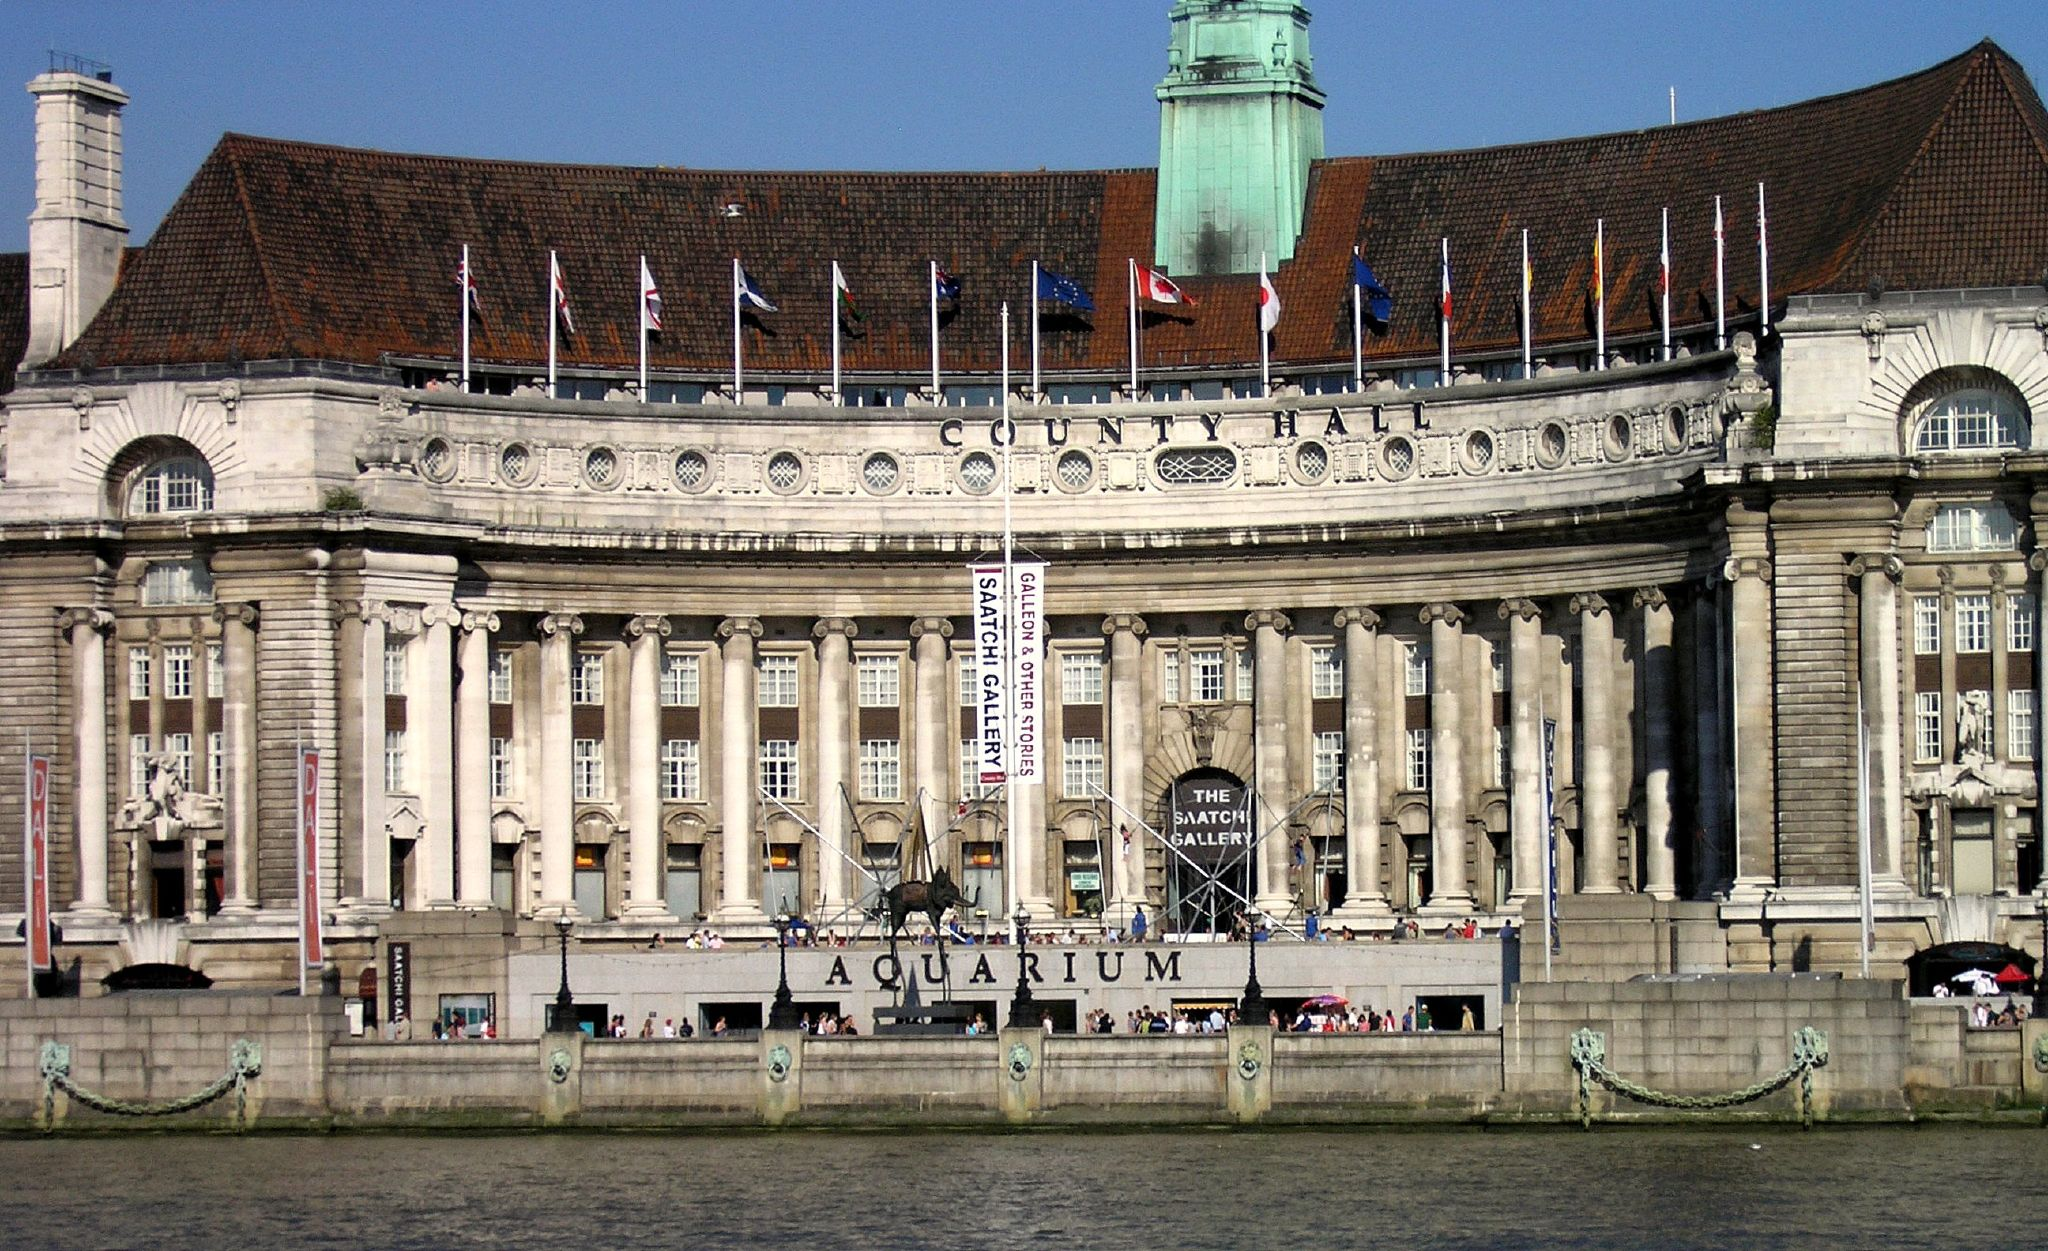 Saatchi Gallery and London Aquarium County Hall photo by gailf548.jpg